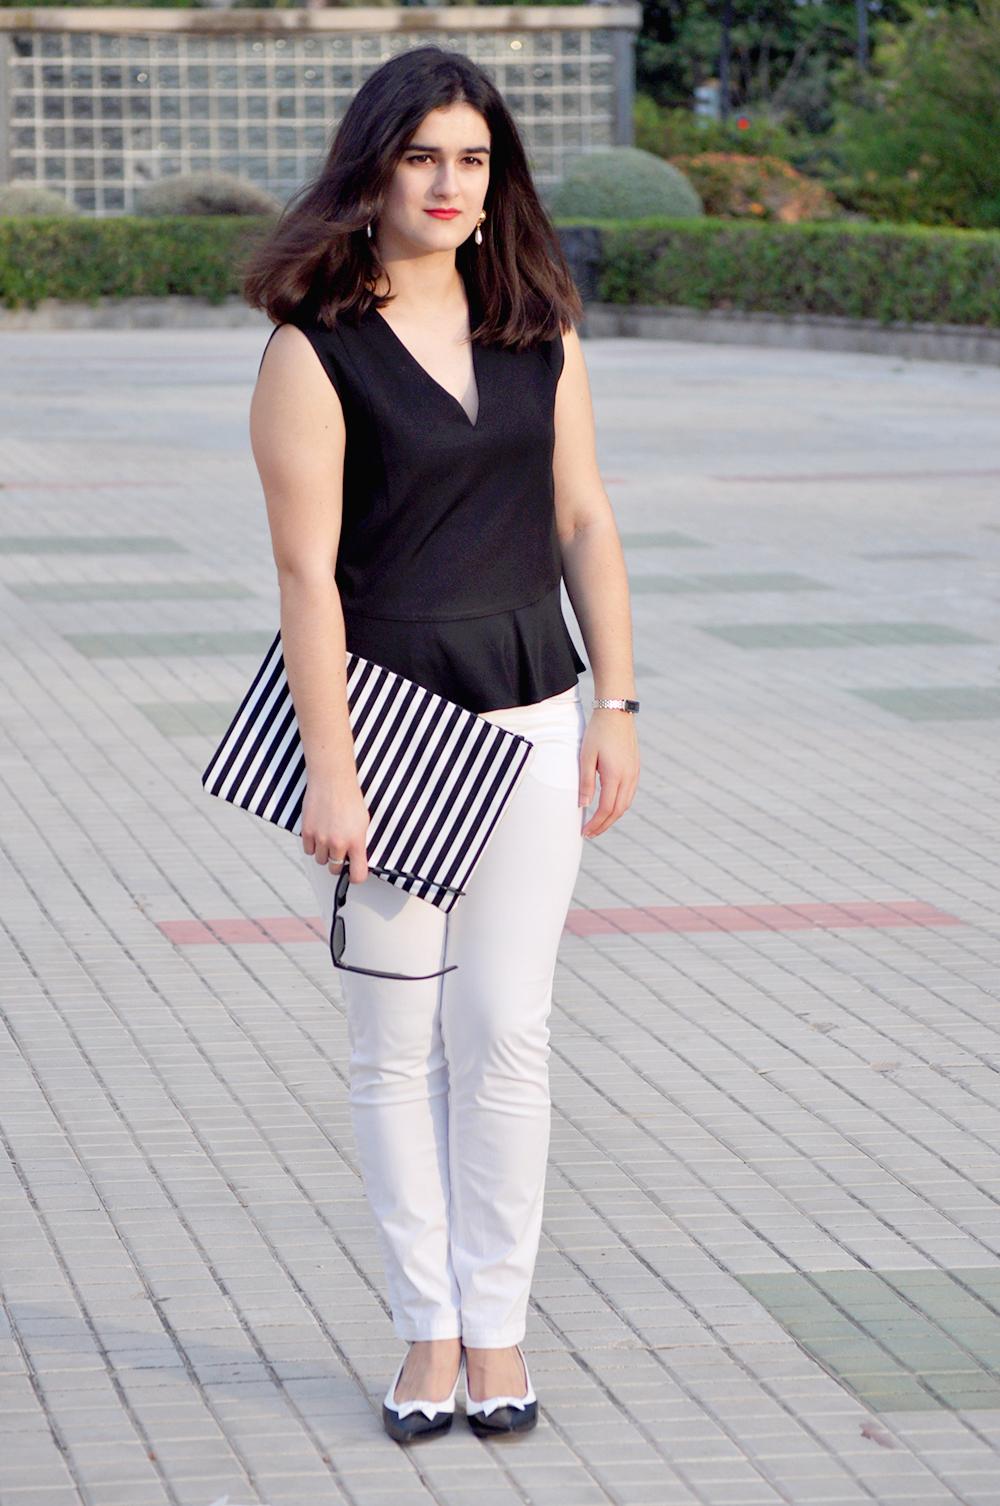 fashion valencia blogger, somethingfashion diy clutch bimba y lola, white streetstyle vlc outfit blog moda, prada vintage earrings, bimbaylola top estilo